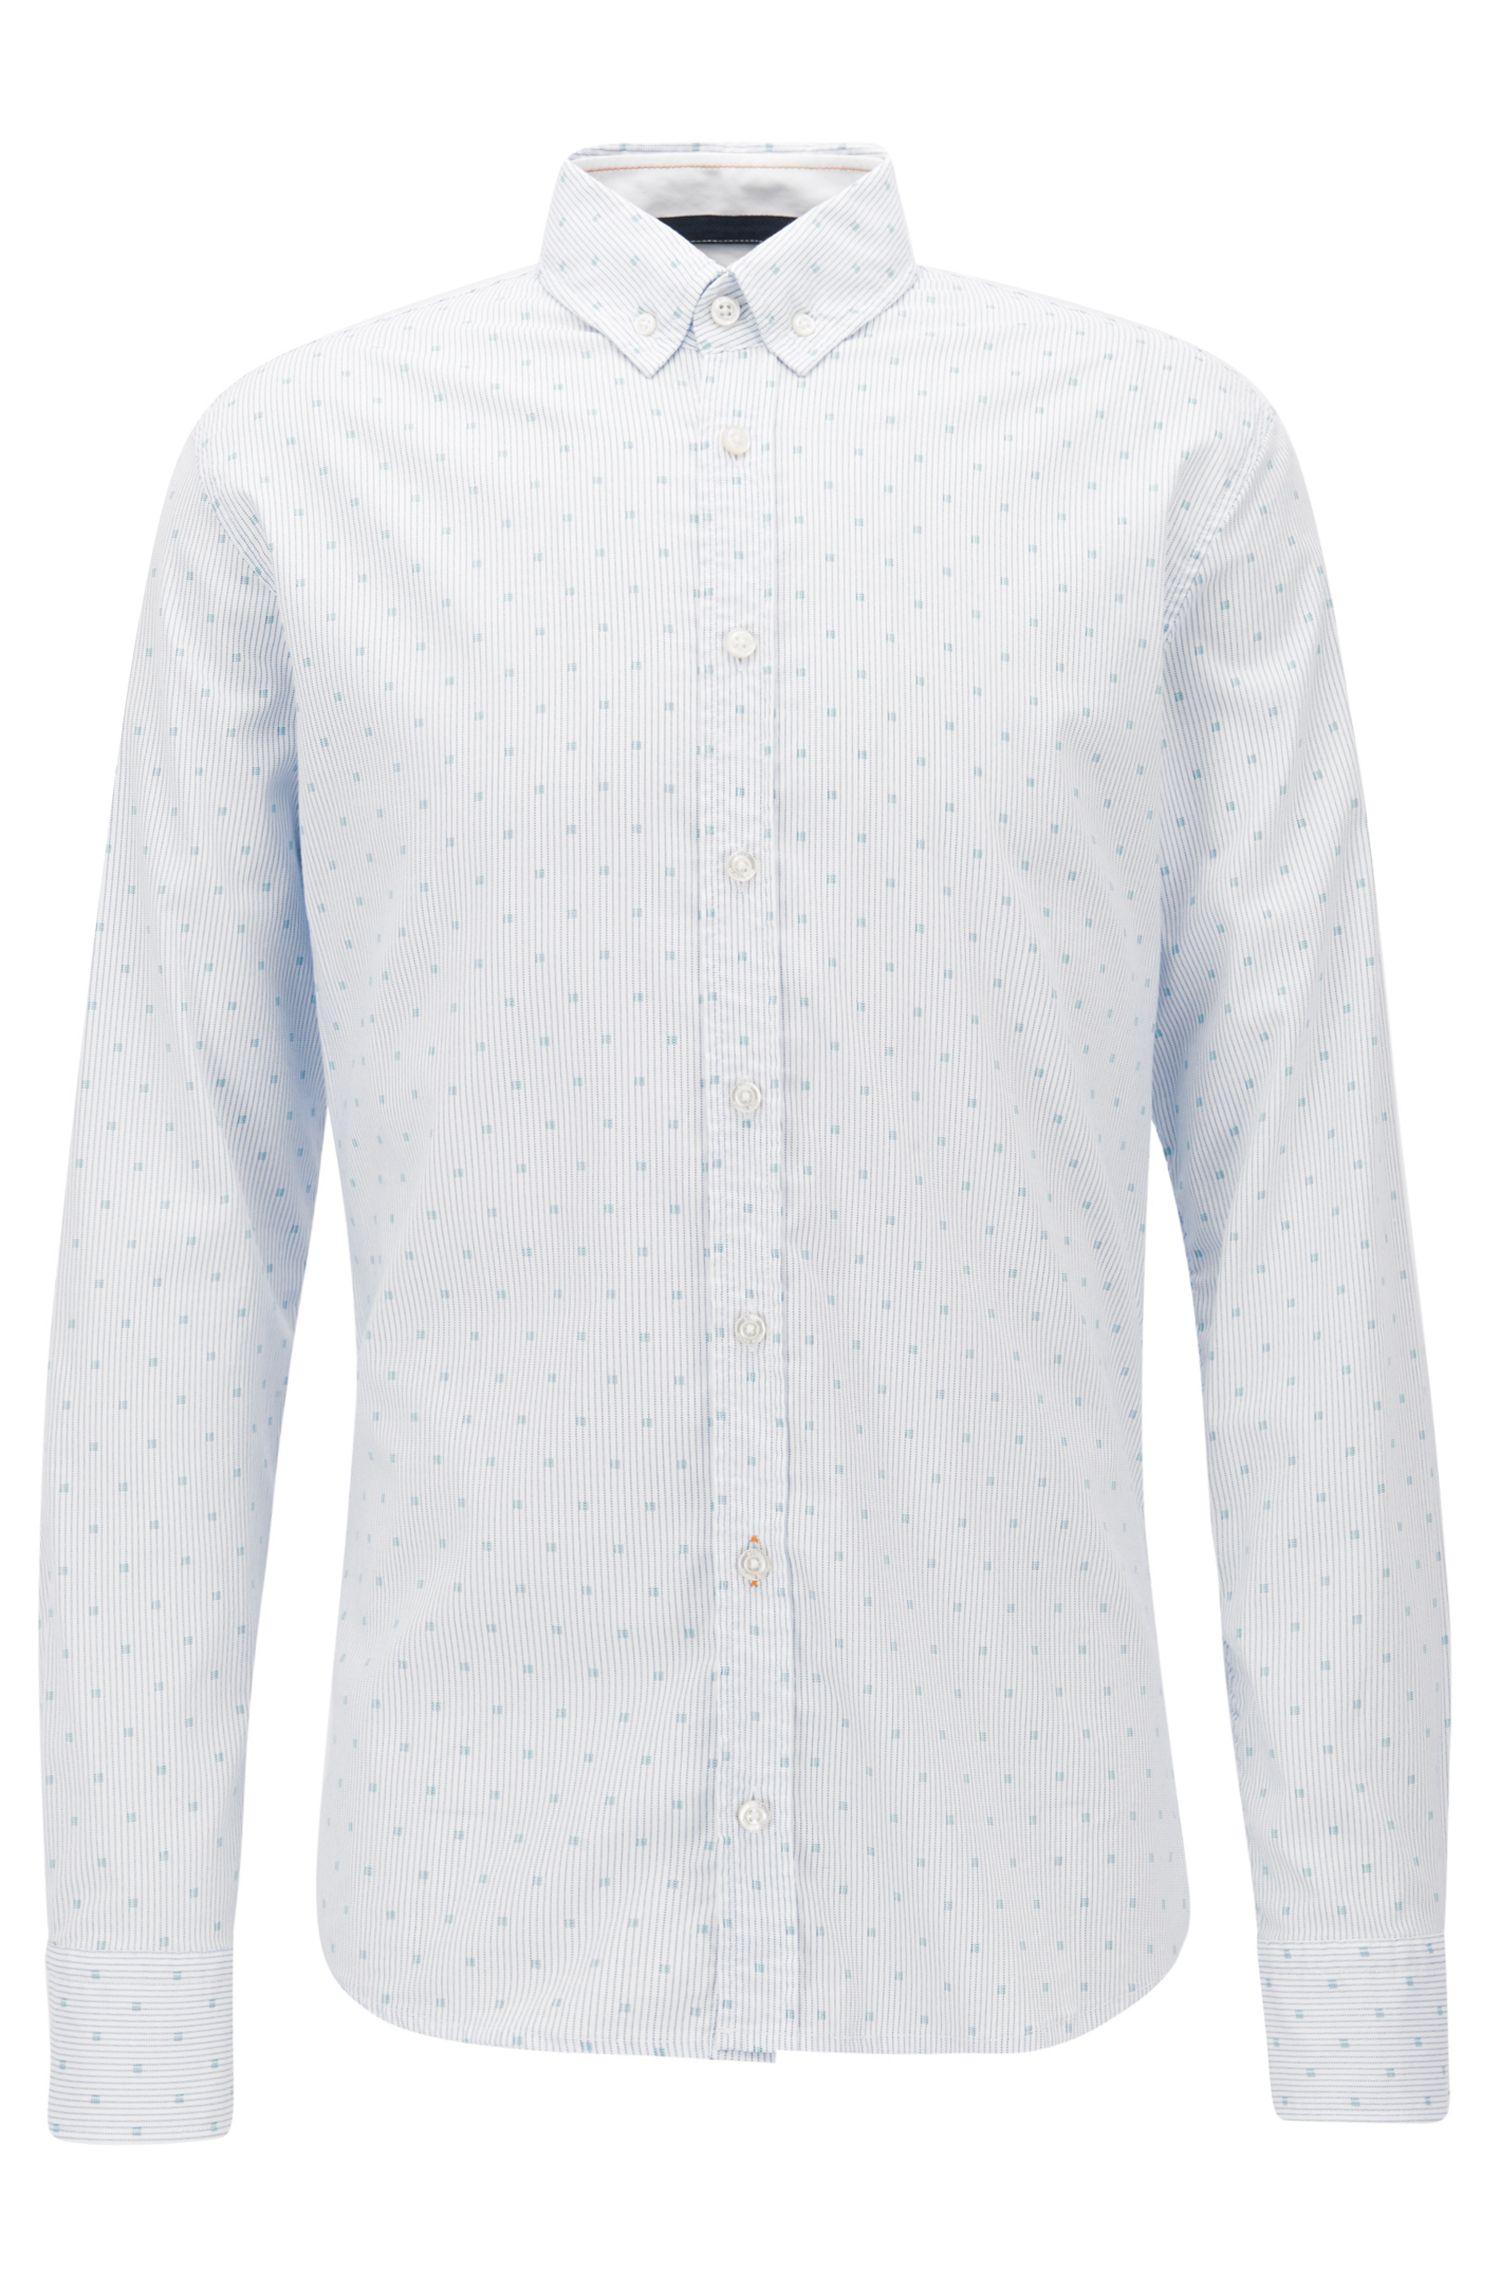 Micro Patterned Cotton Sport Shirt, Slim Fit | Epreppy